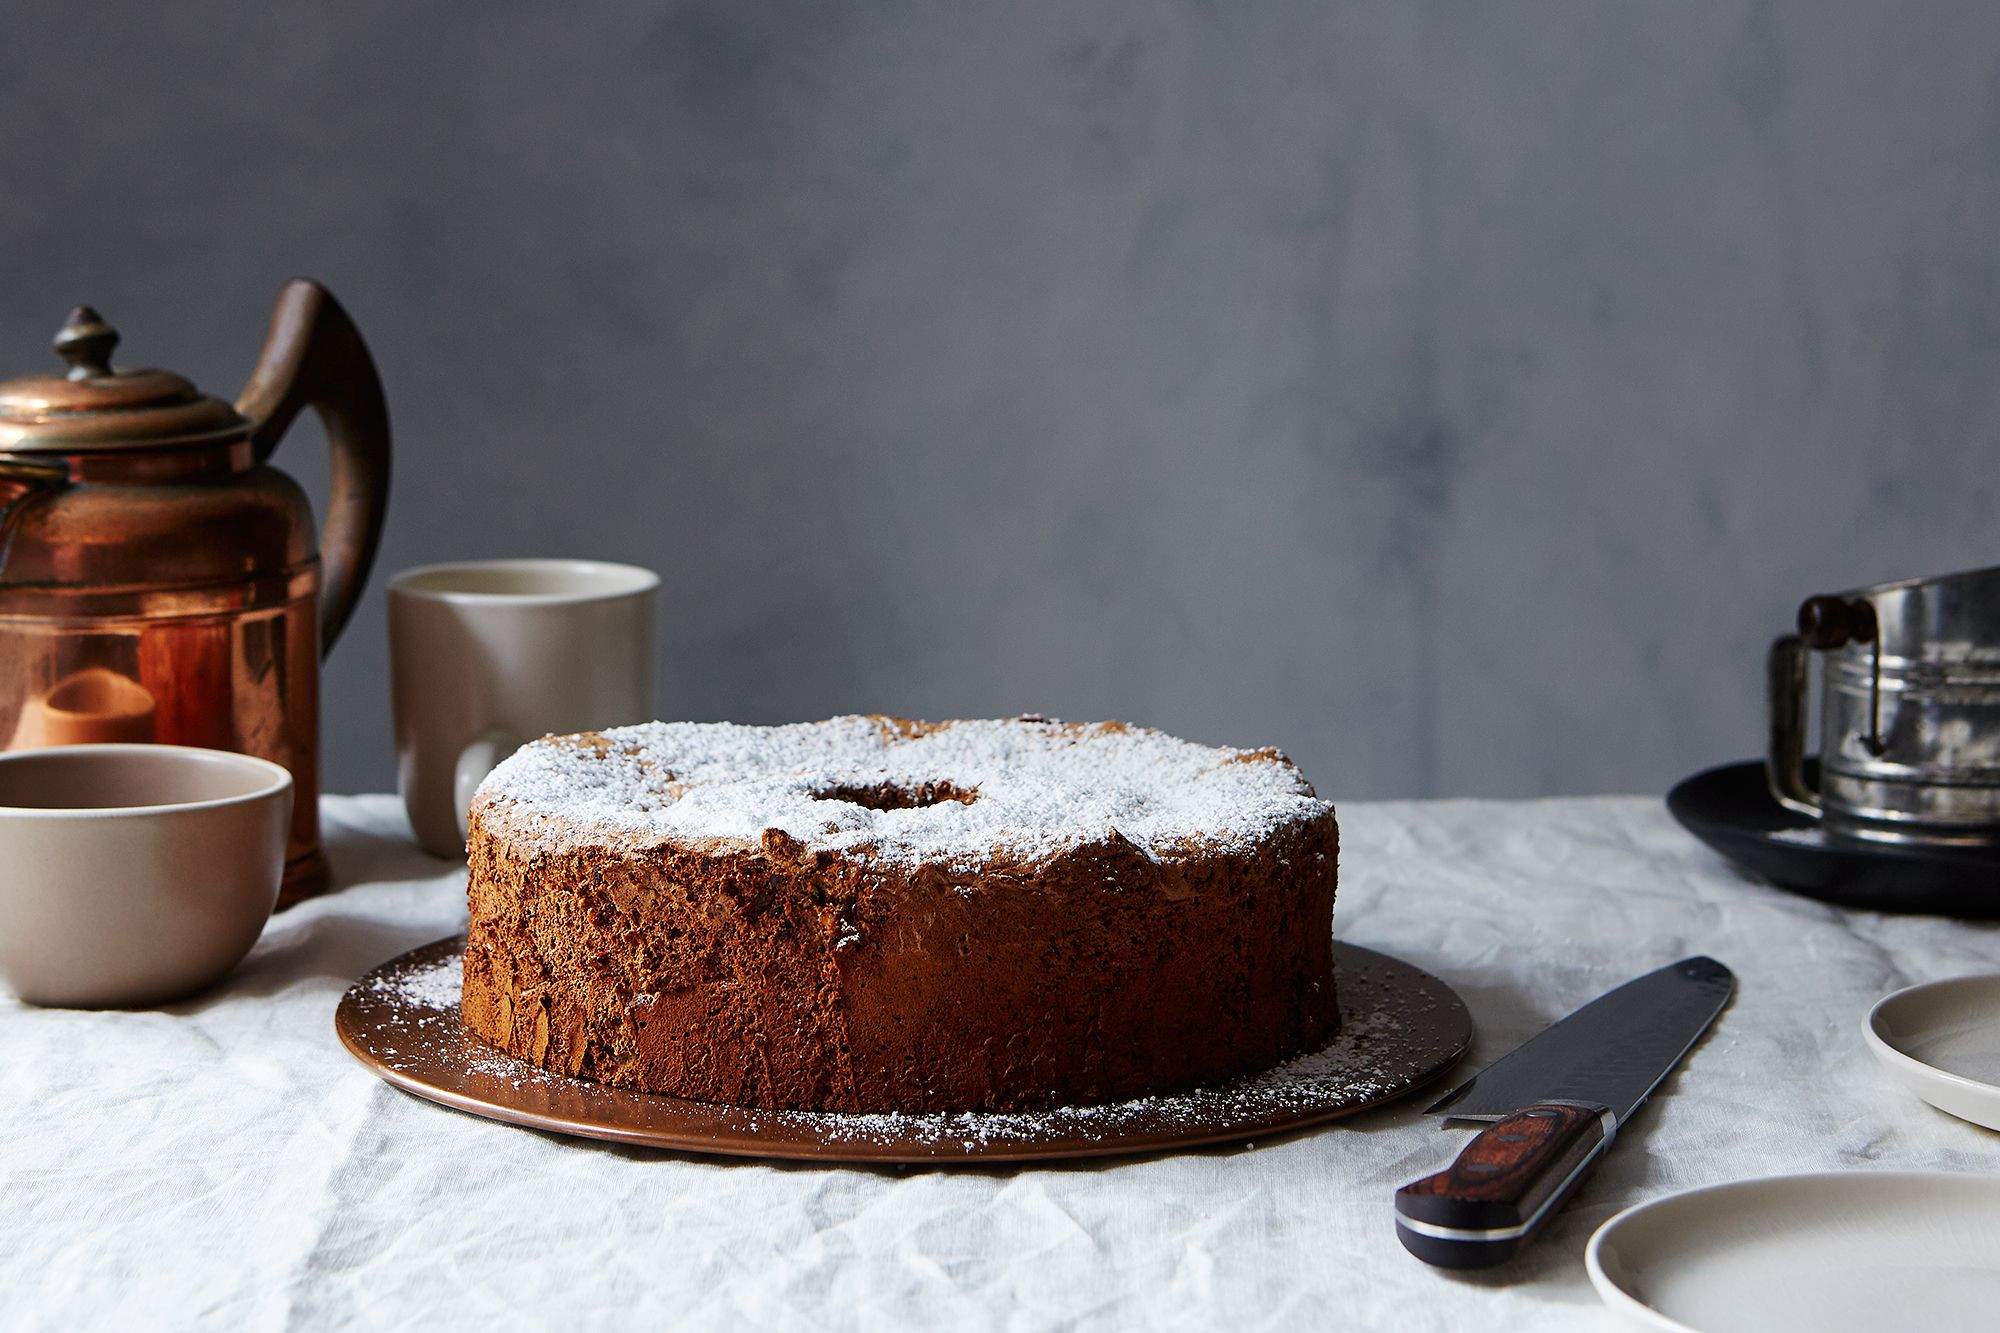 Passover Sponge Cake Recipes  Kosher for Passover Chocolate Nut Sponge Cake Recipe